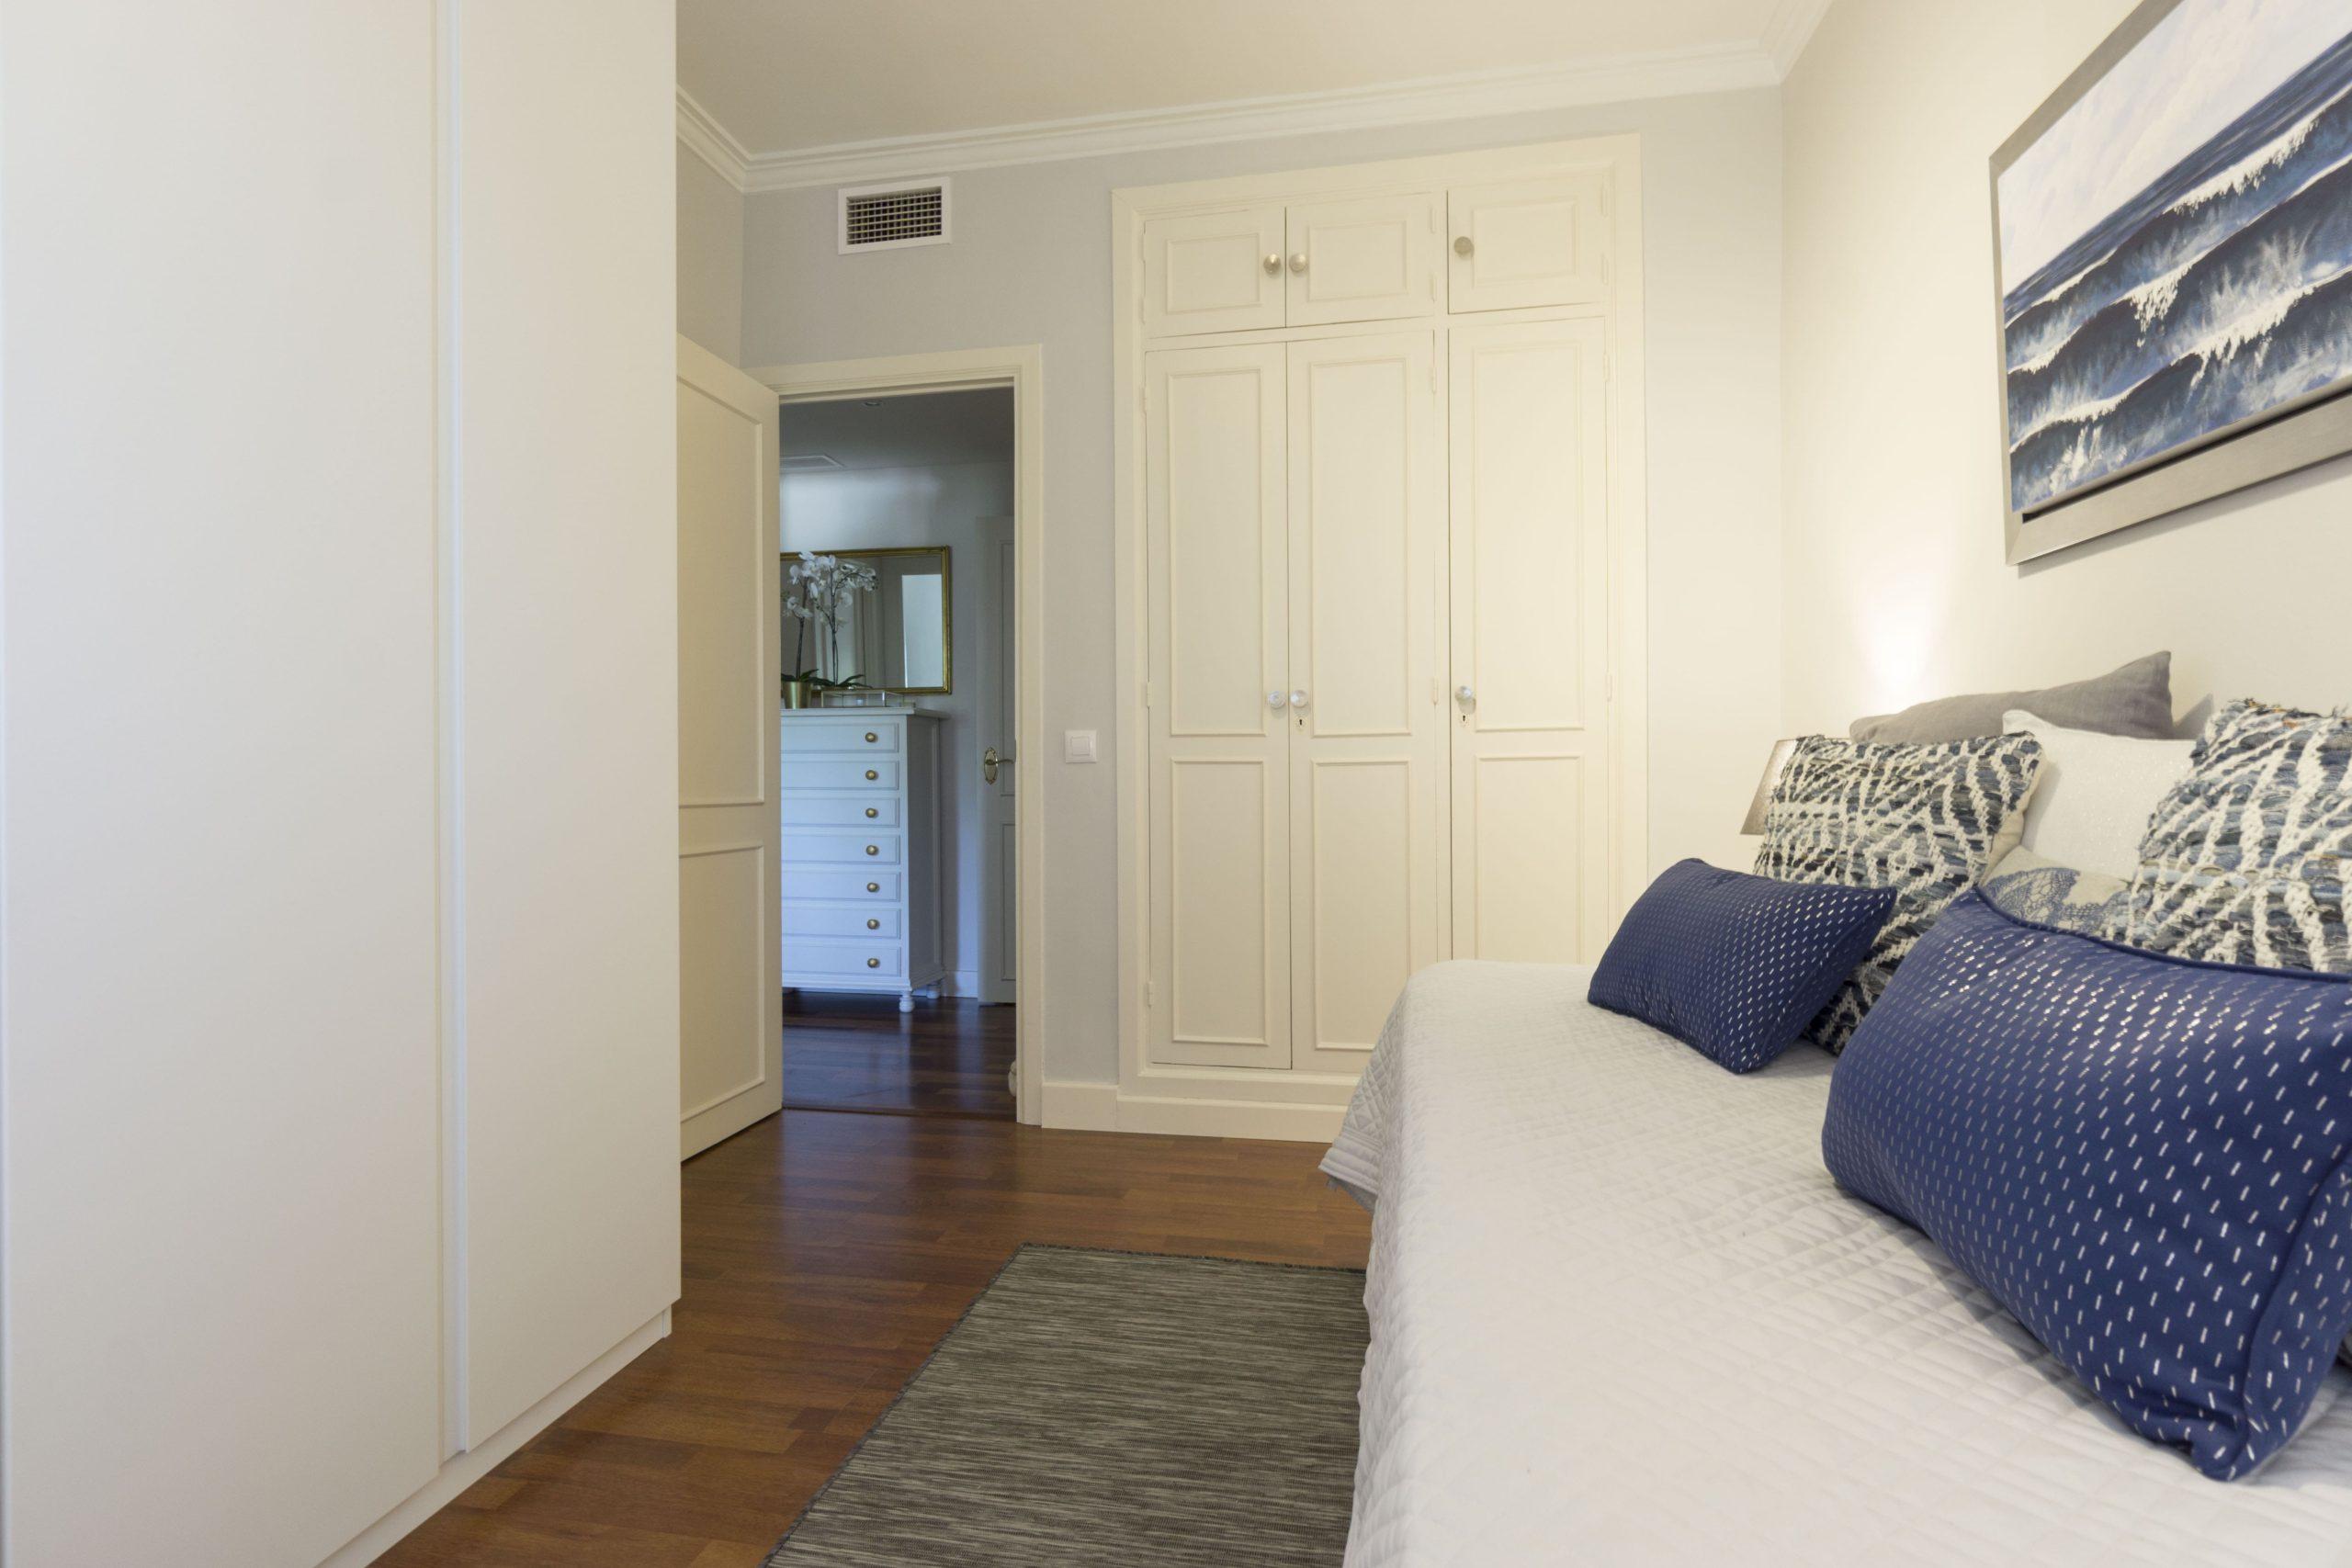 Habitación sin uso pasillo